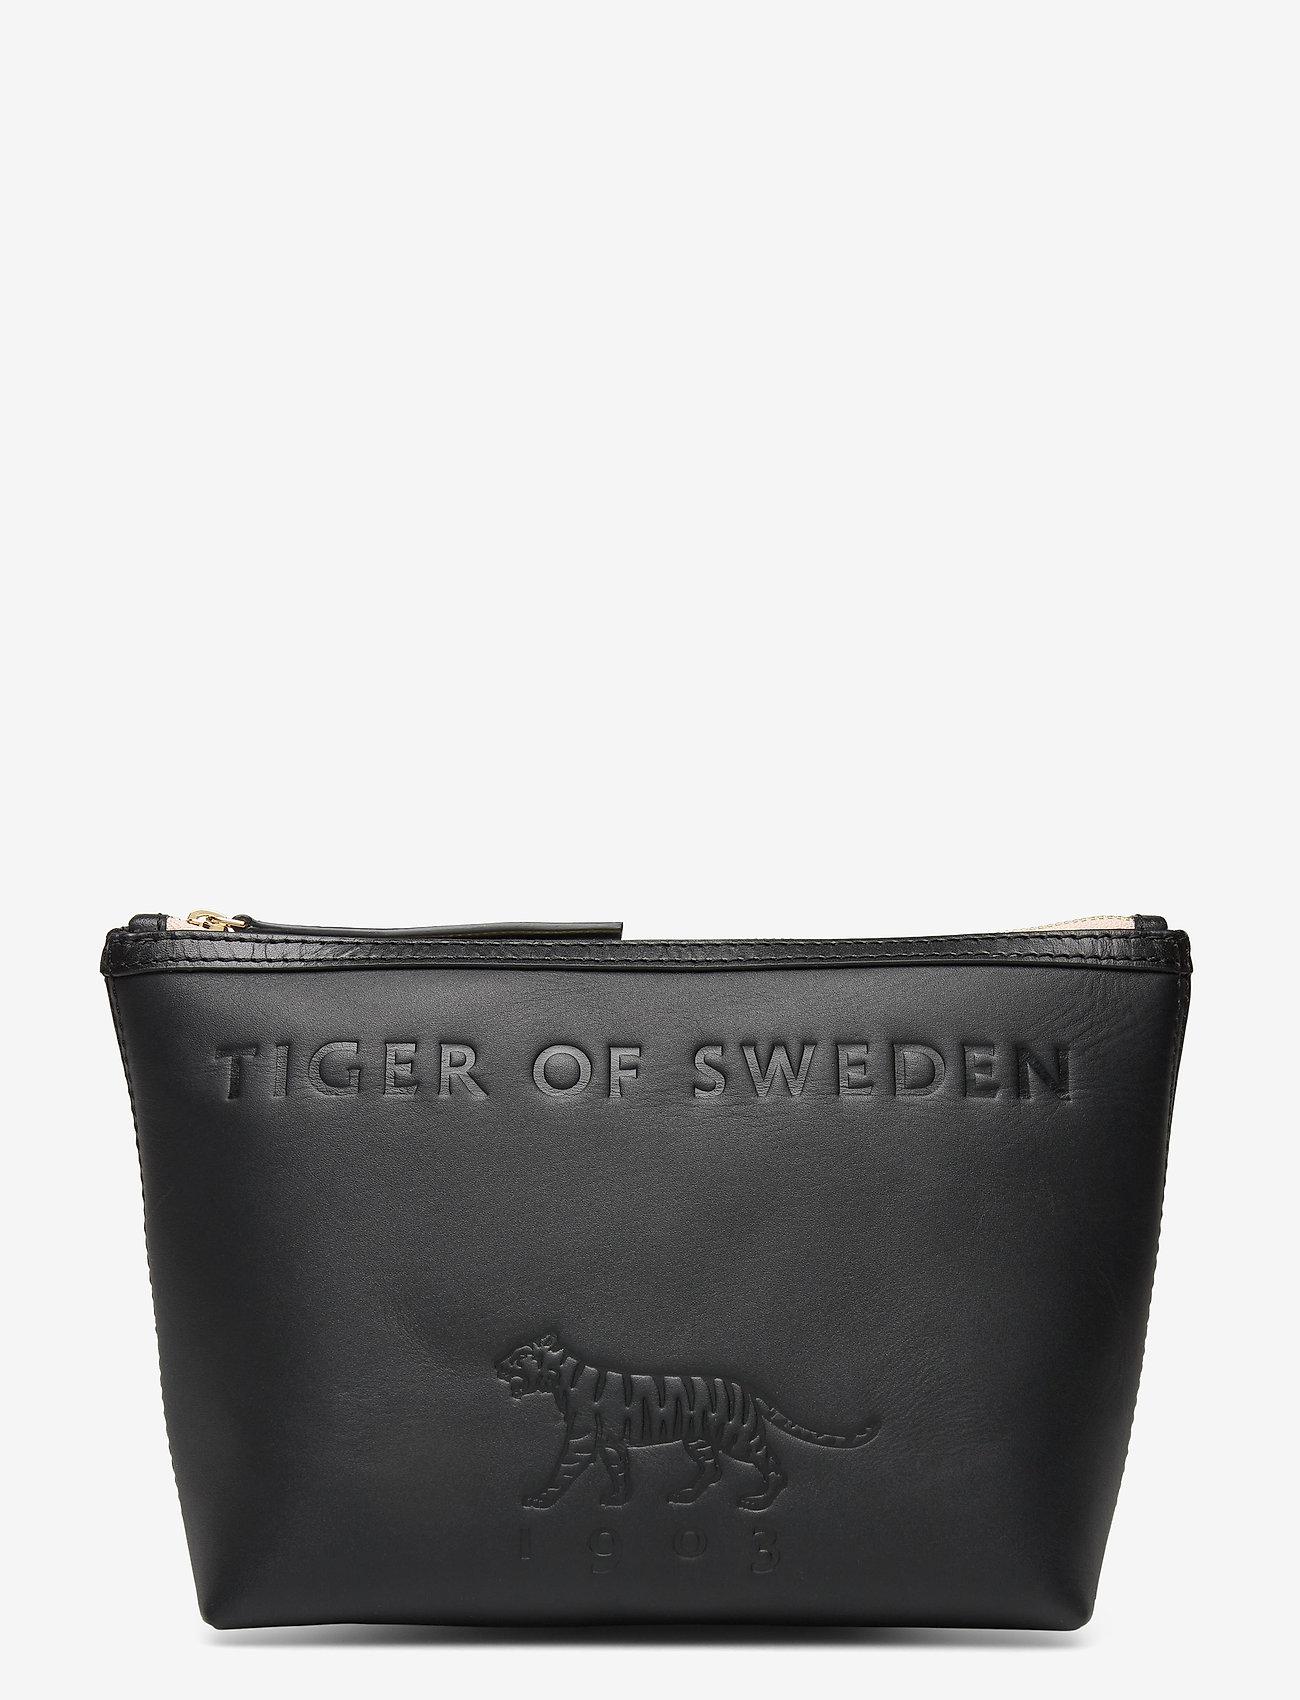 Tiger of Sweden - DORSO - torby kosmetyczne - black - 0